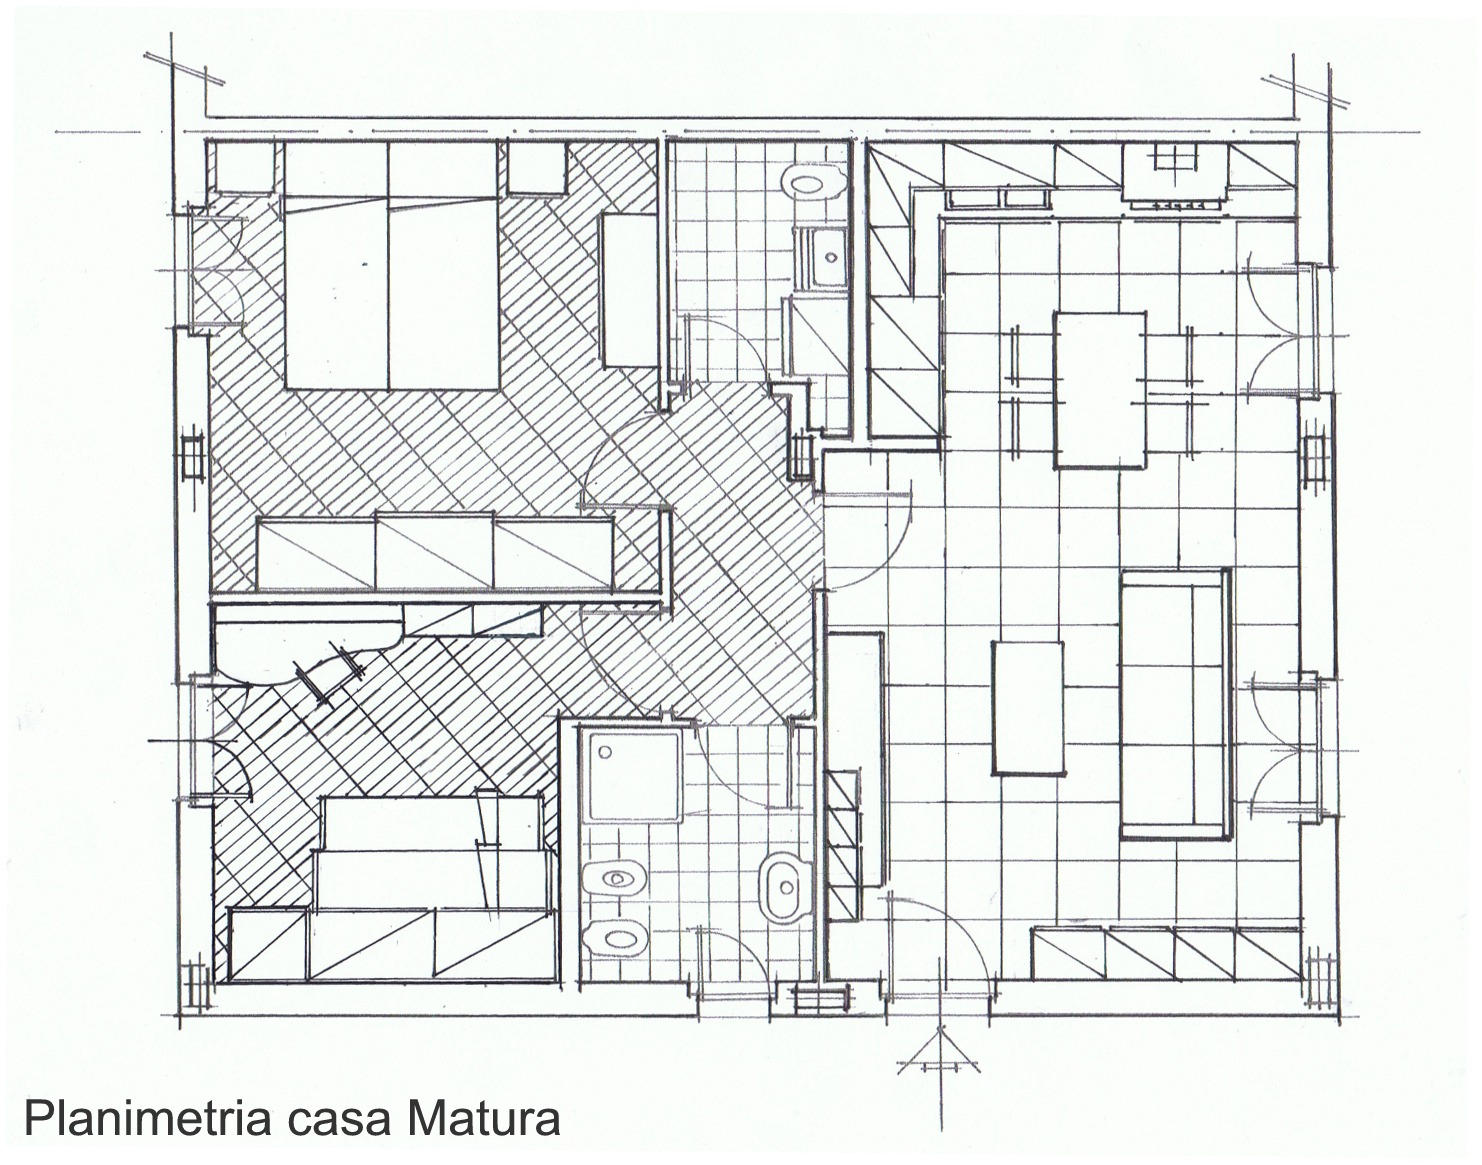 Quanto costa arredare casa parte 2 eurom arredamenti for Disegnare planimetria casa online gratis